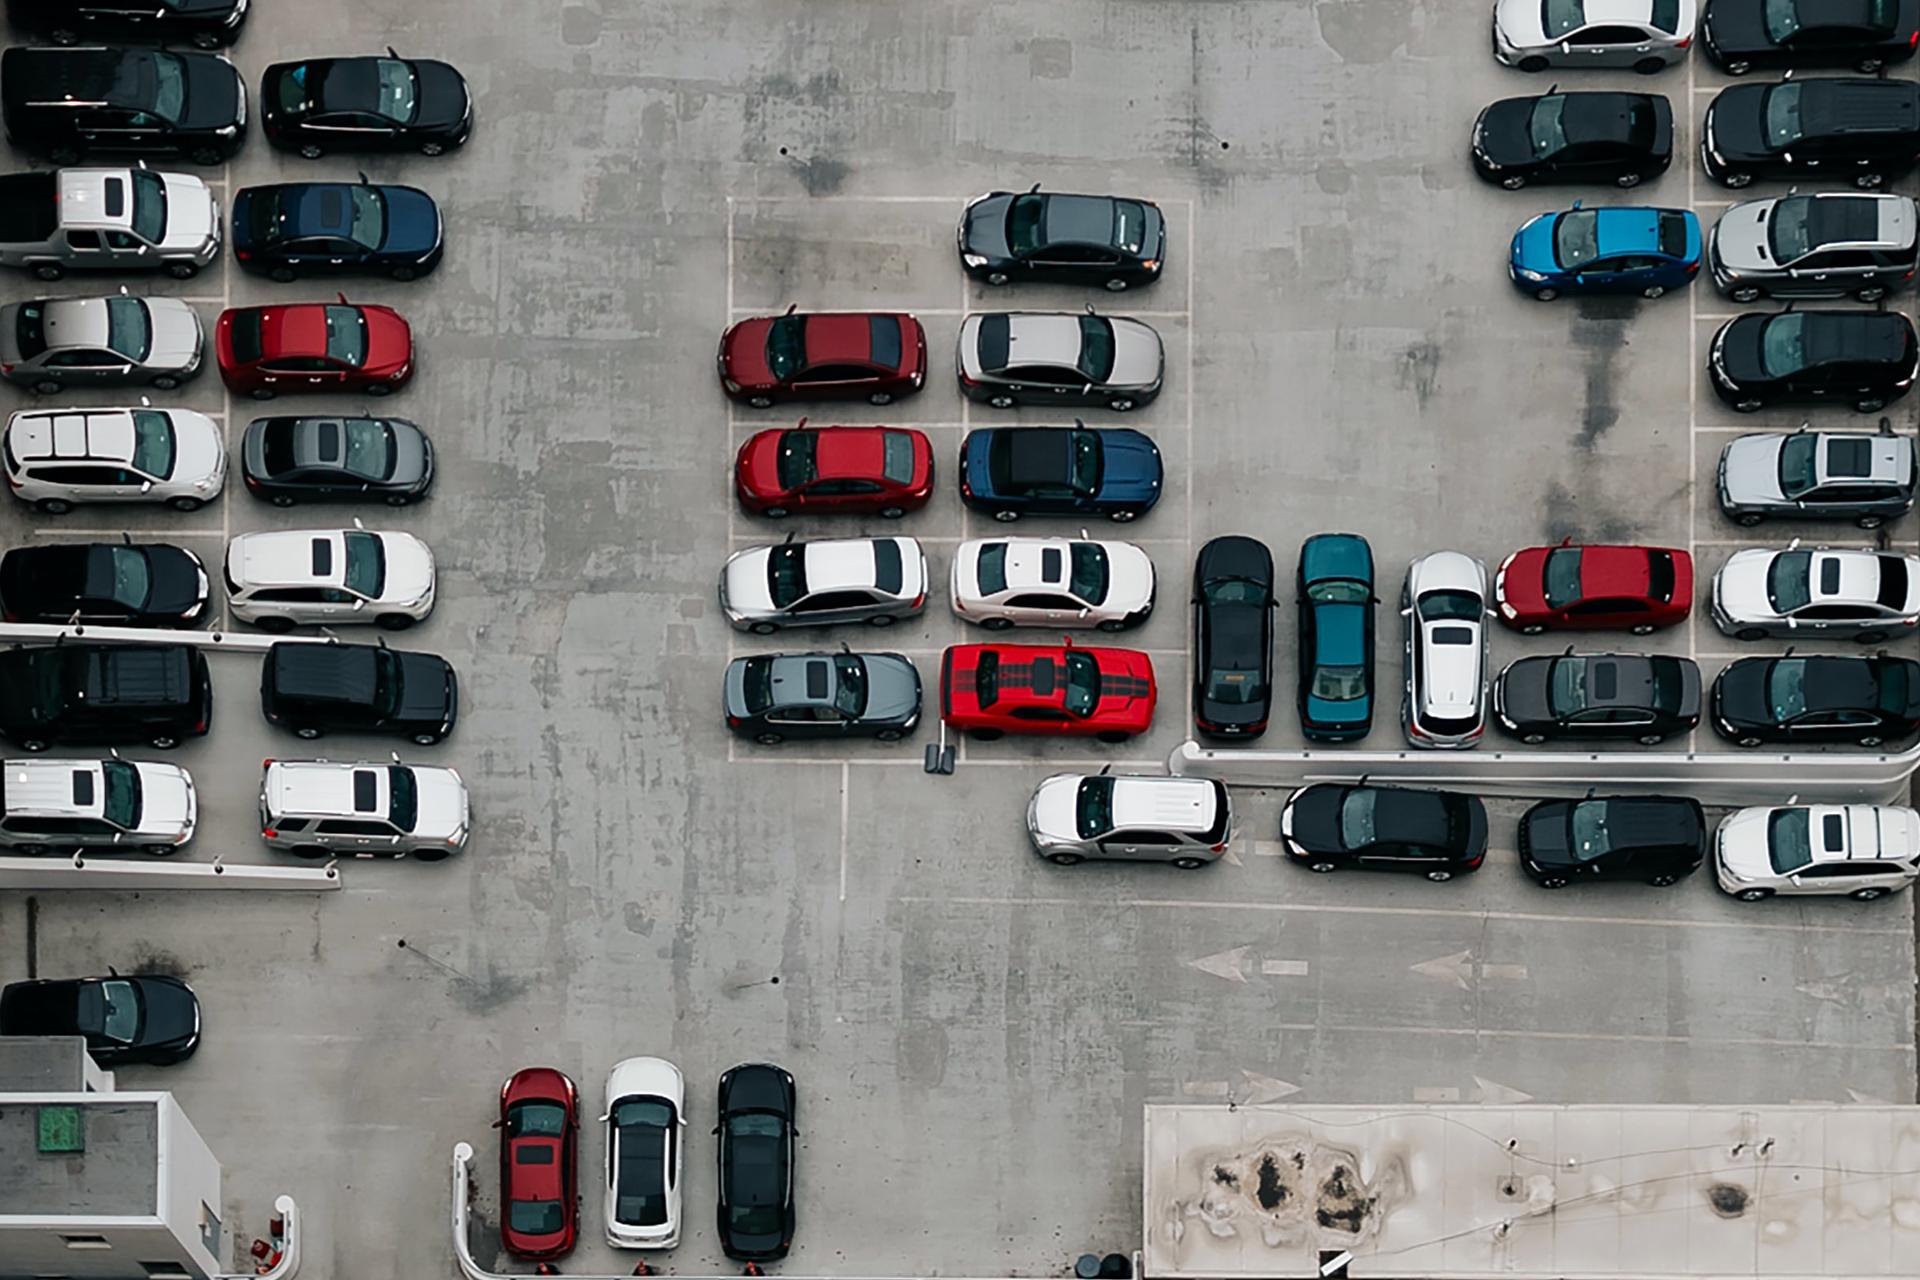 Crowded car lot. Photo by Ivana Cajina on Unsplash.